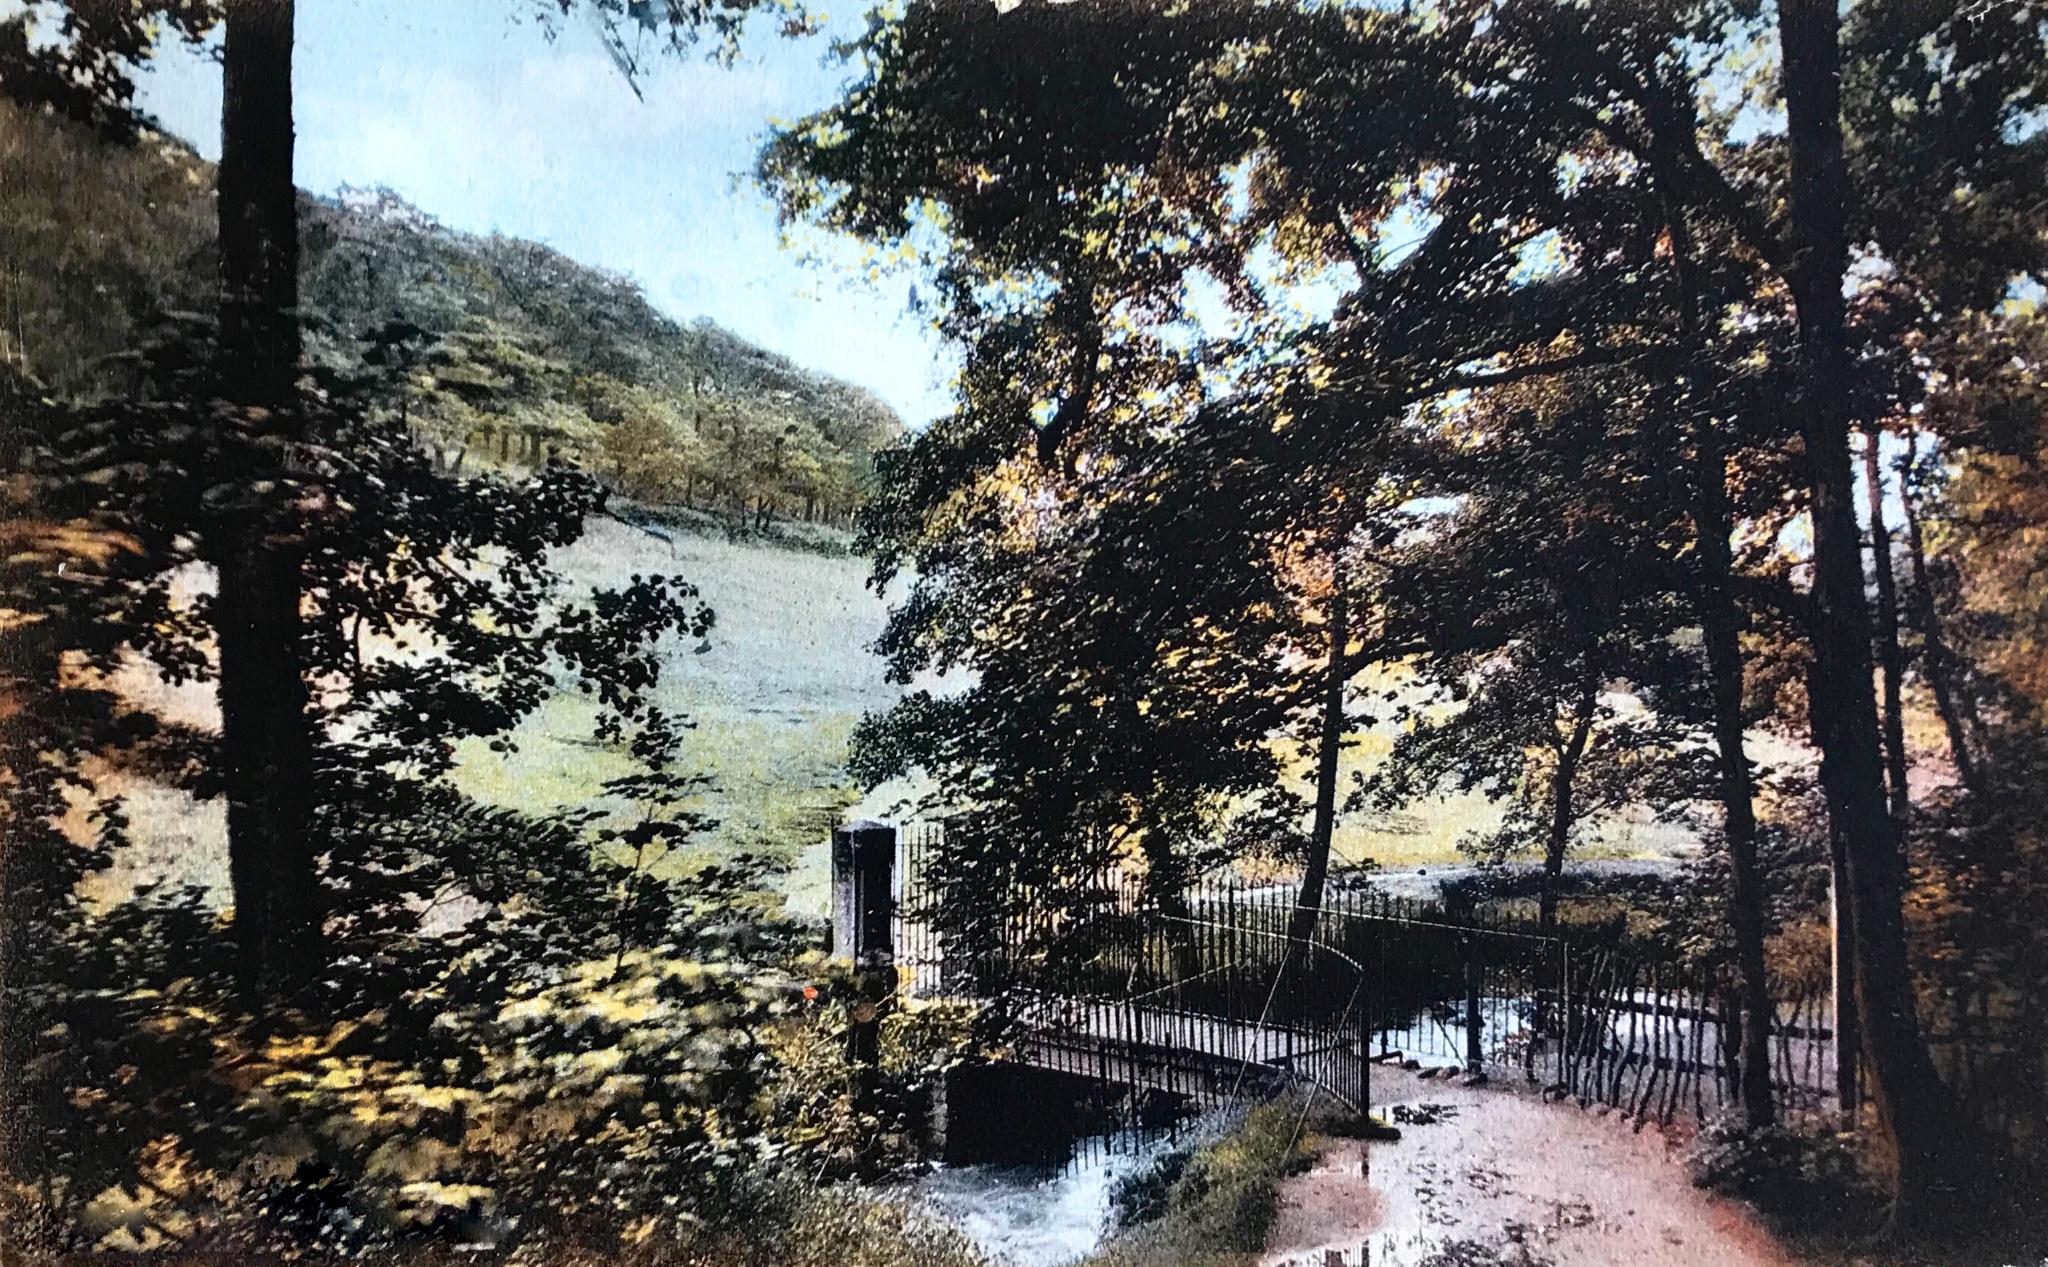 The Hollies, New Bridge with Iron Railings, undated